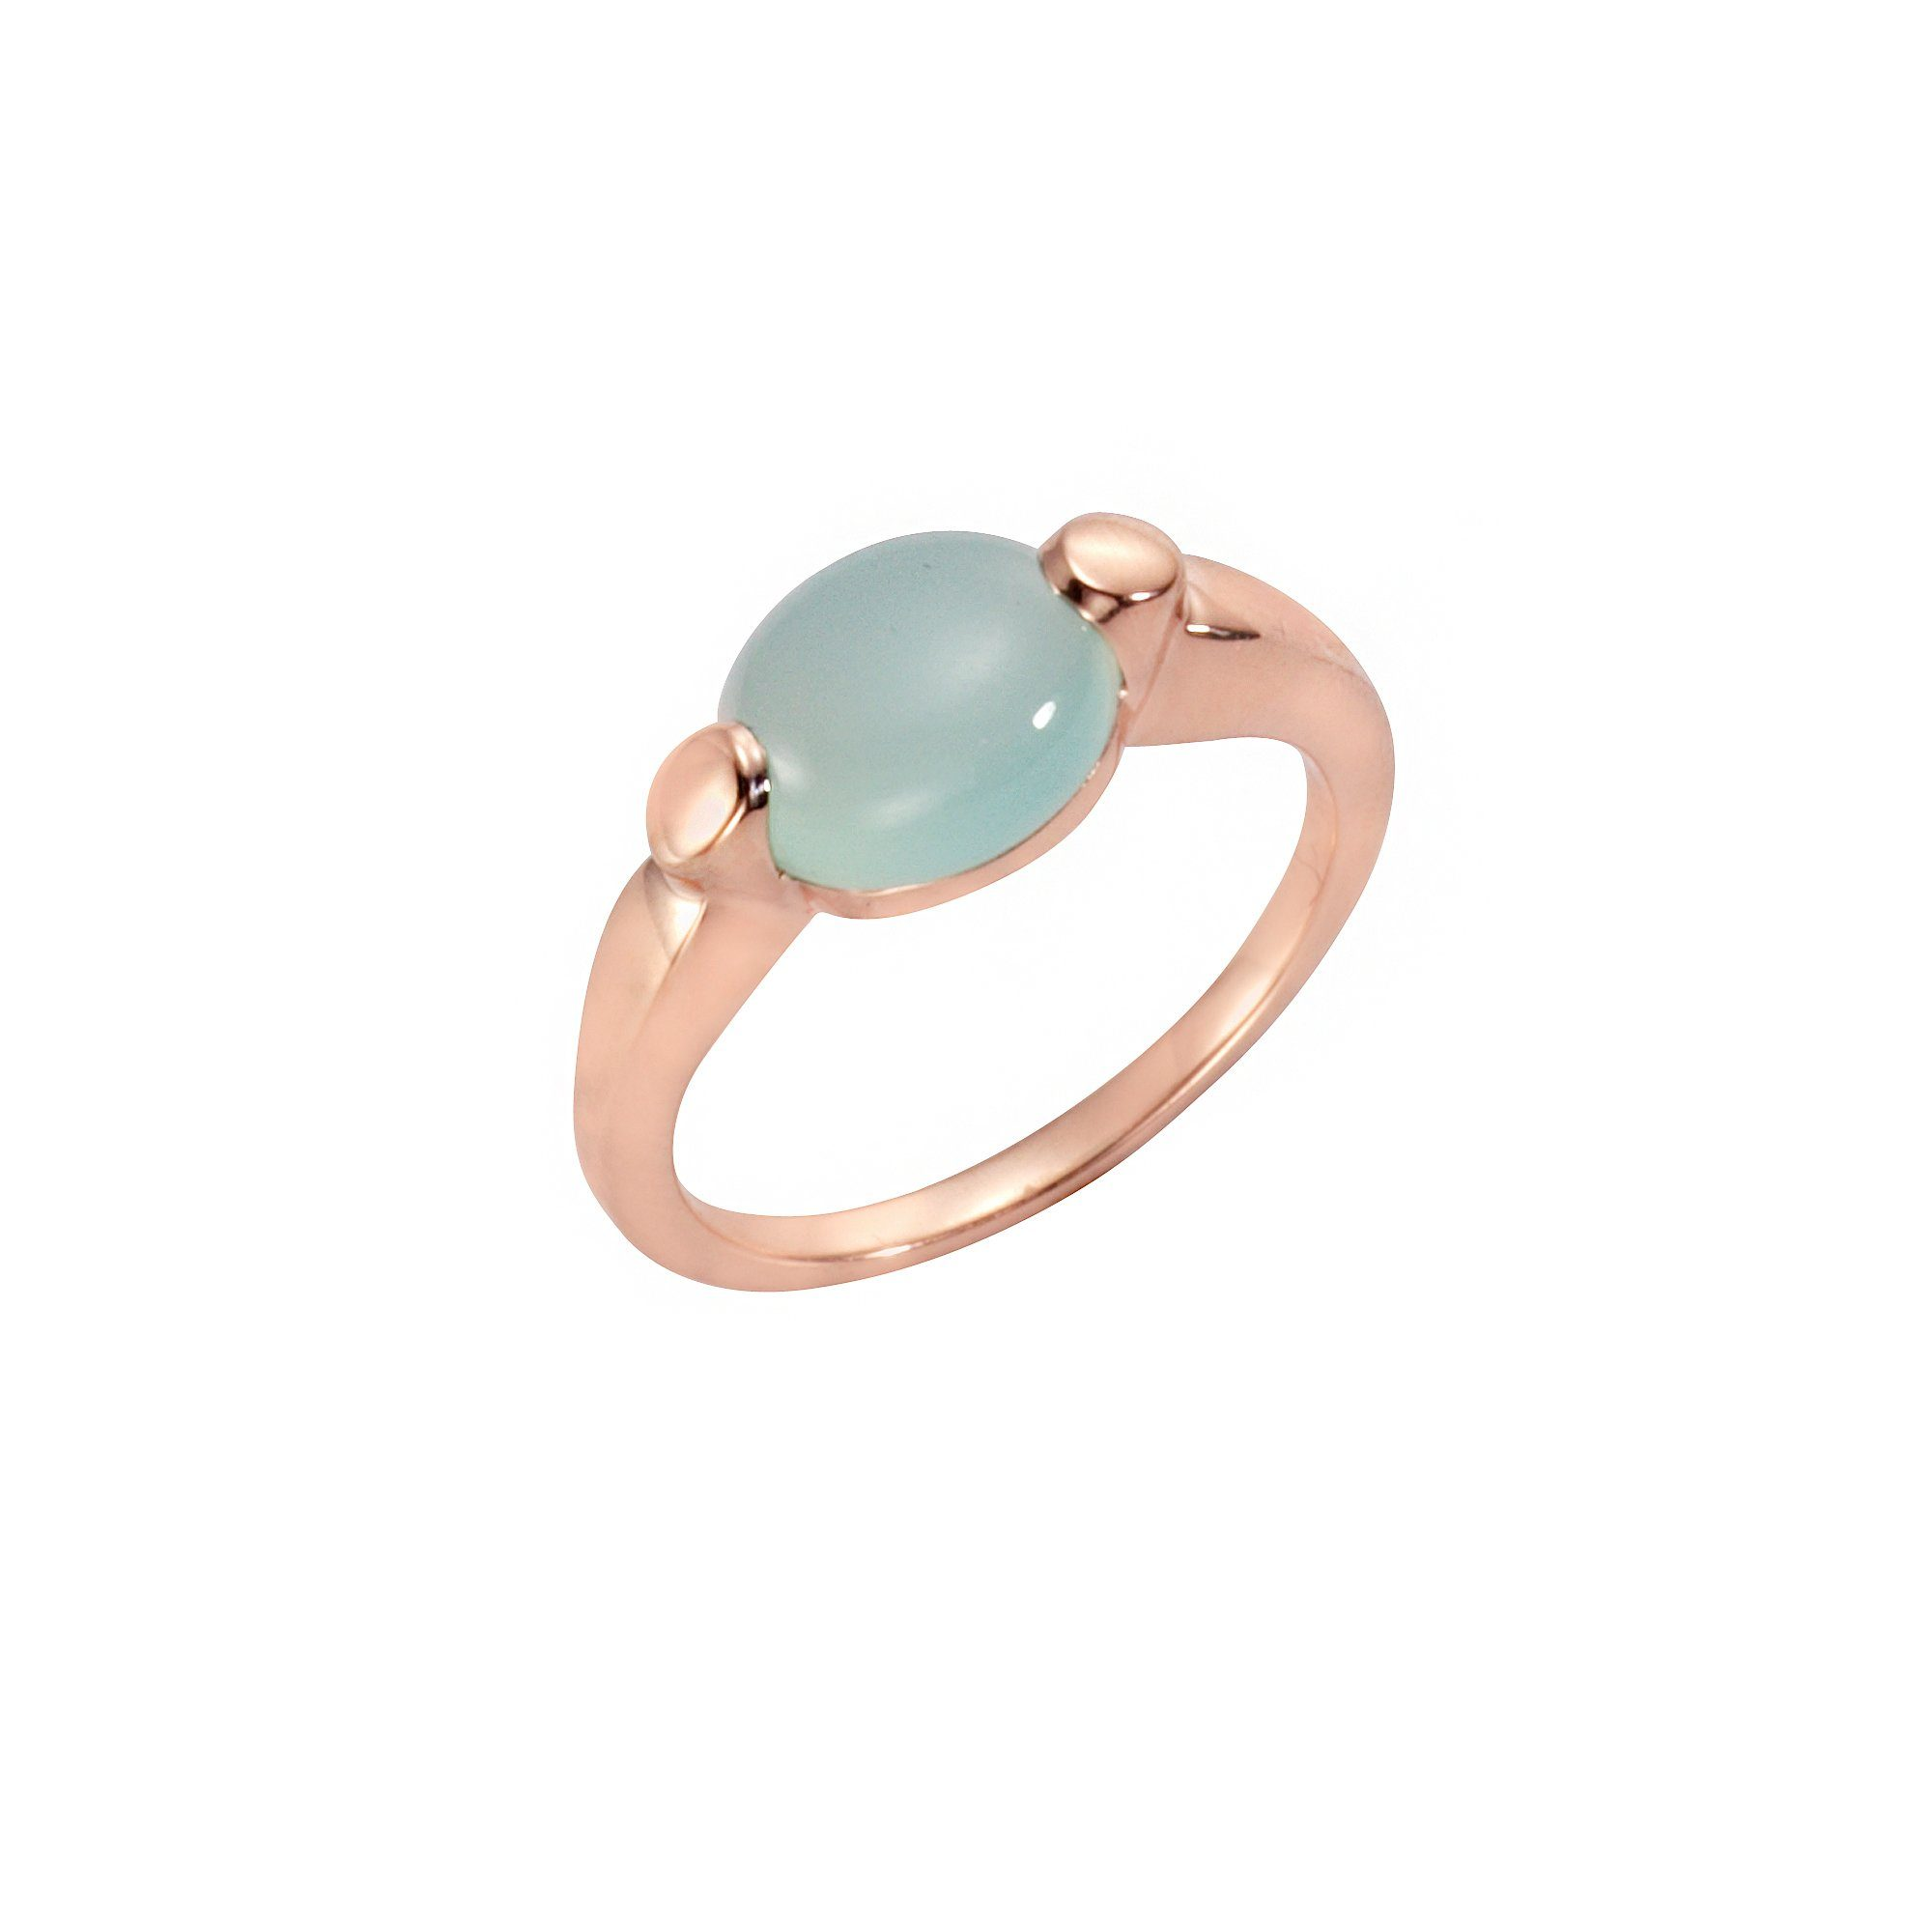 Kaufen Ring Jamelli Silber Online Chalcedon«Modernes Rosévergoldet Mit »925Sterling Design 4Ljq5Ac3R